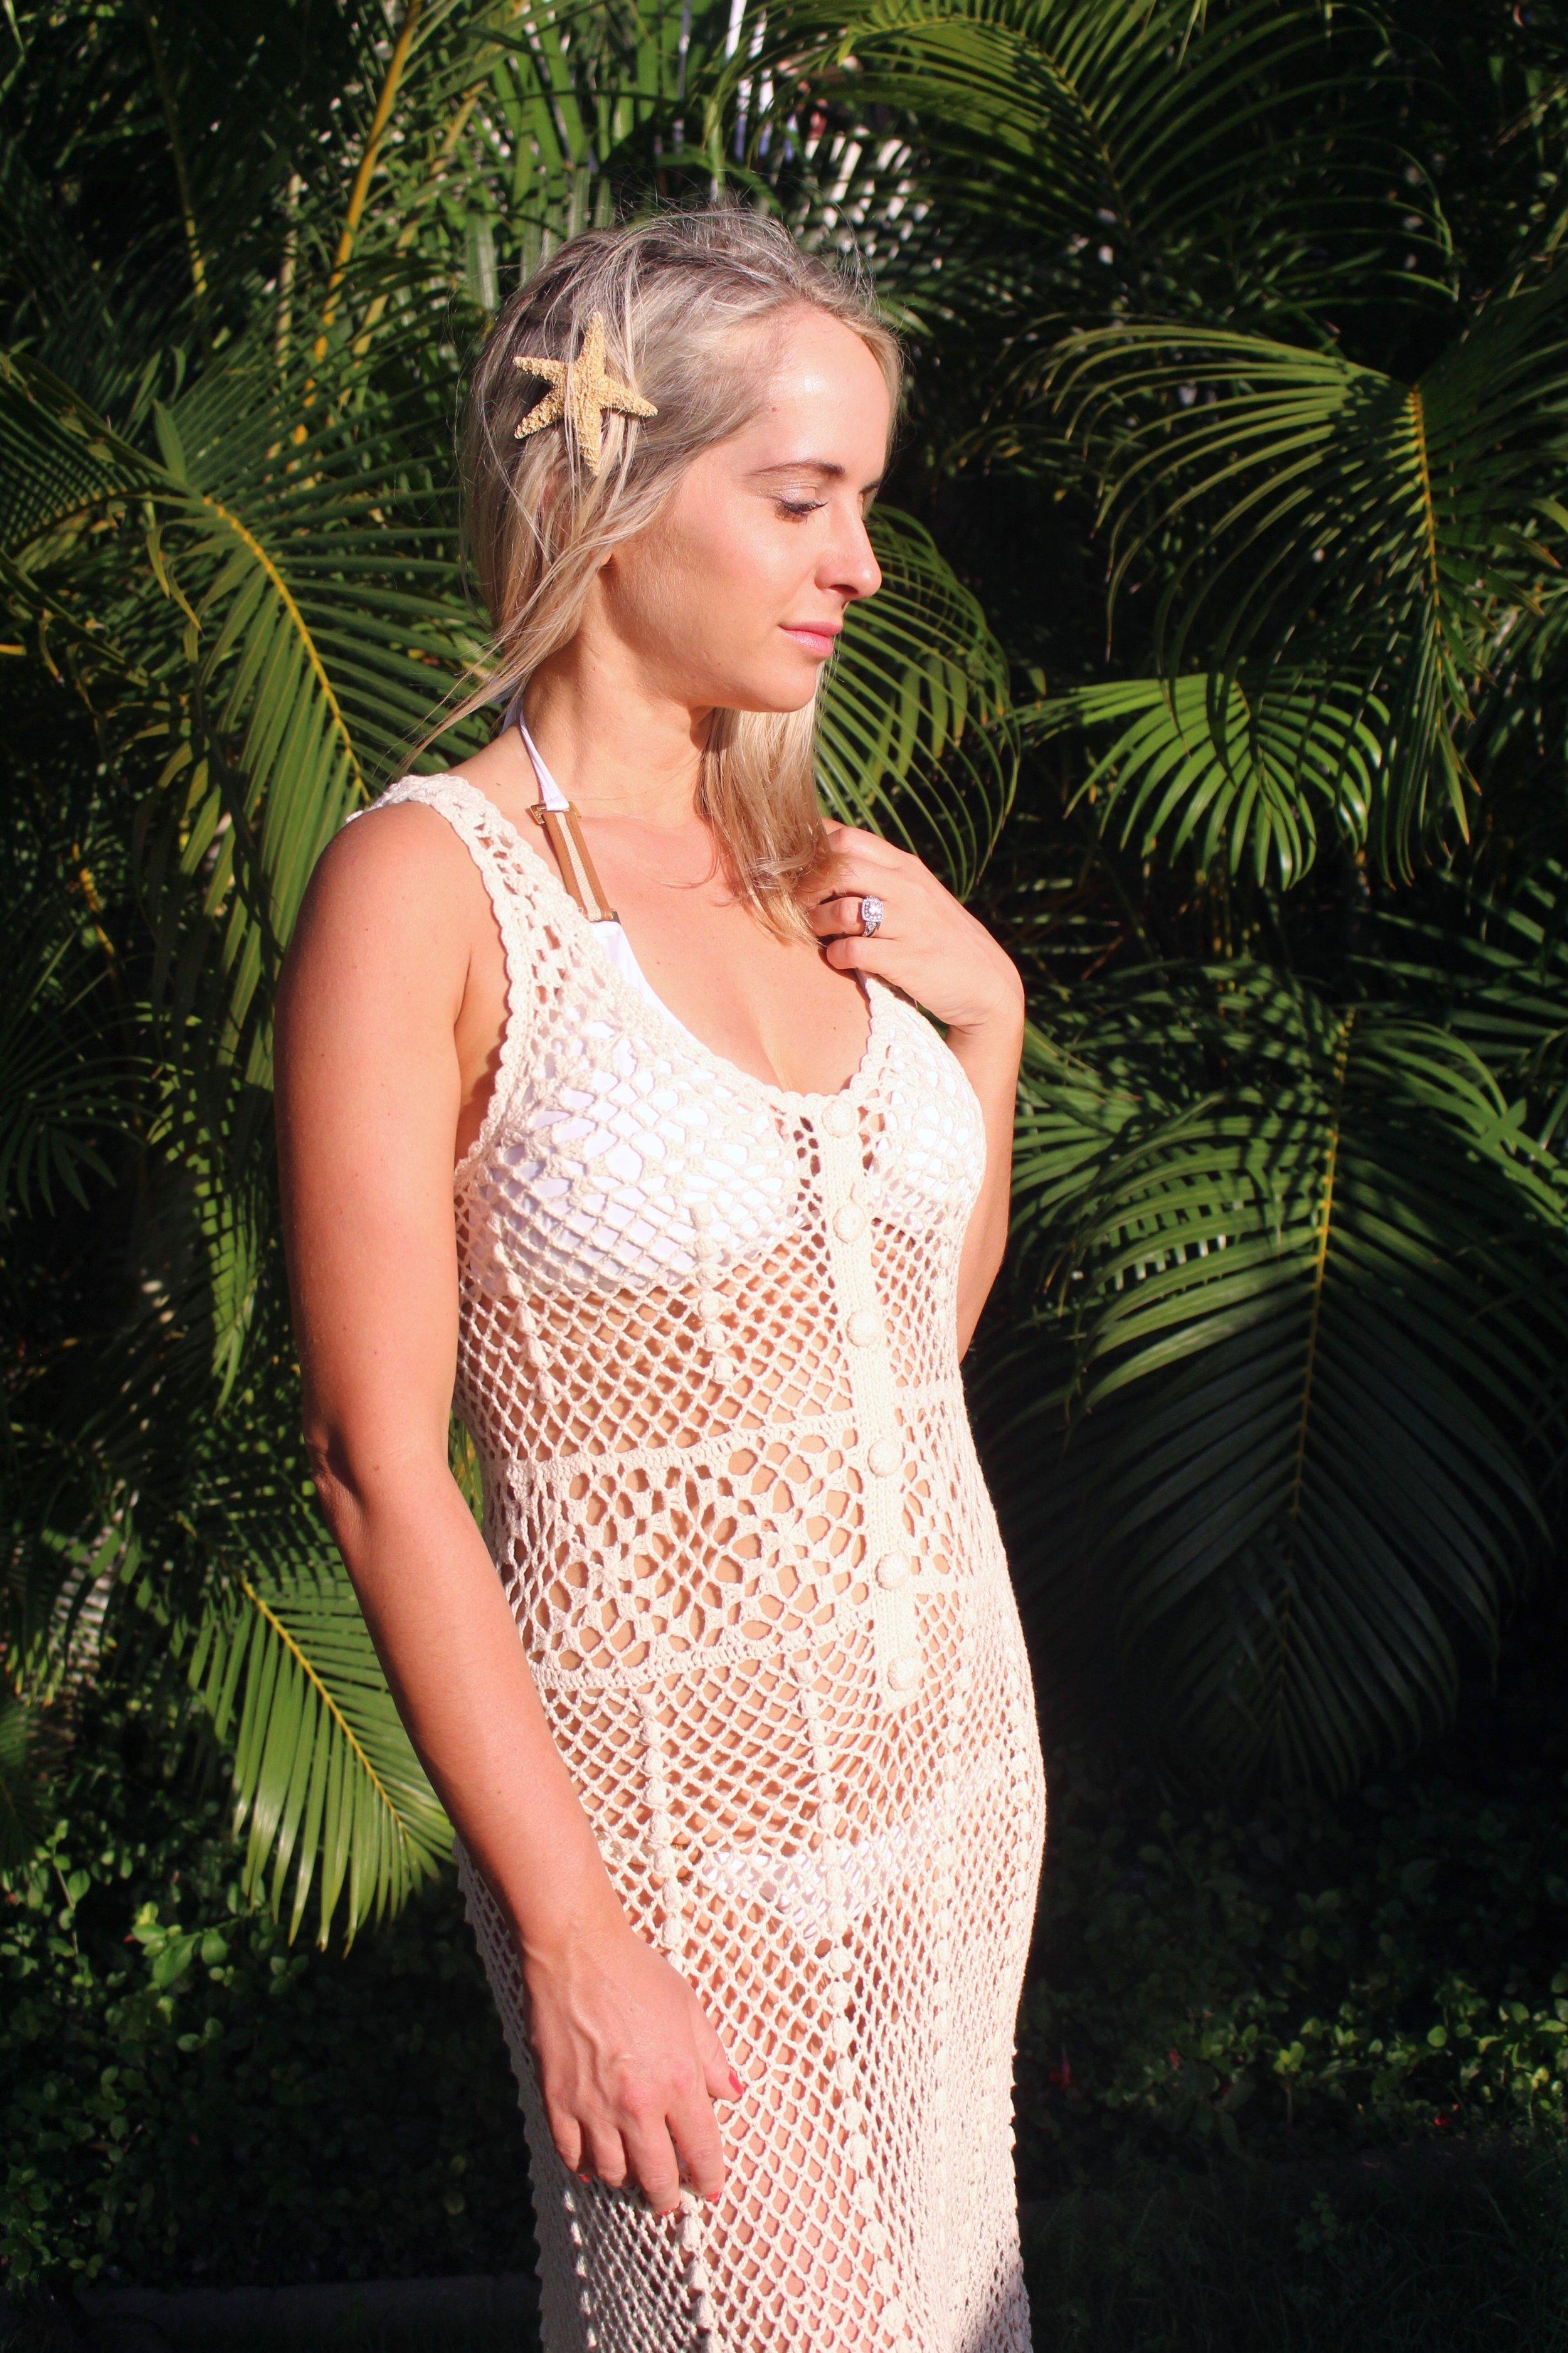 Cream crochet cover-up,  Urban Outfitters . White bikini with leather hardware, Vix Swimwear- similar  here .Starfish clip, similar  here .